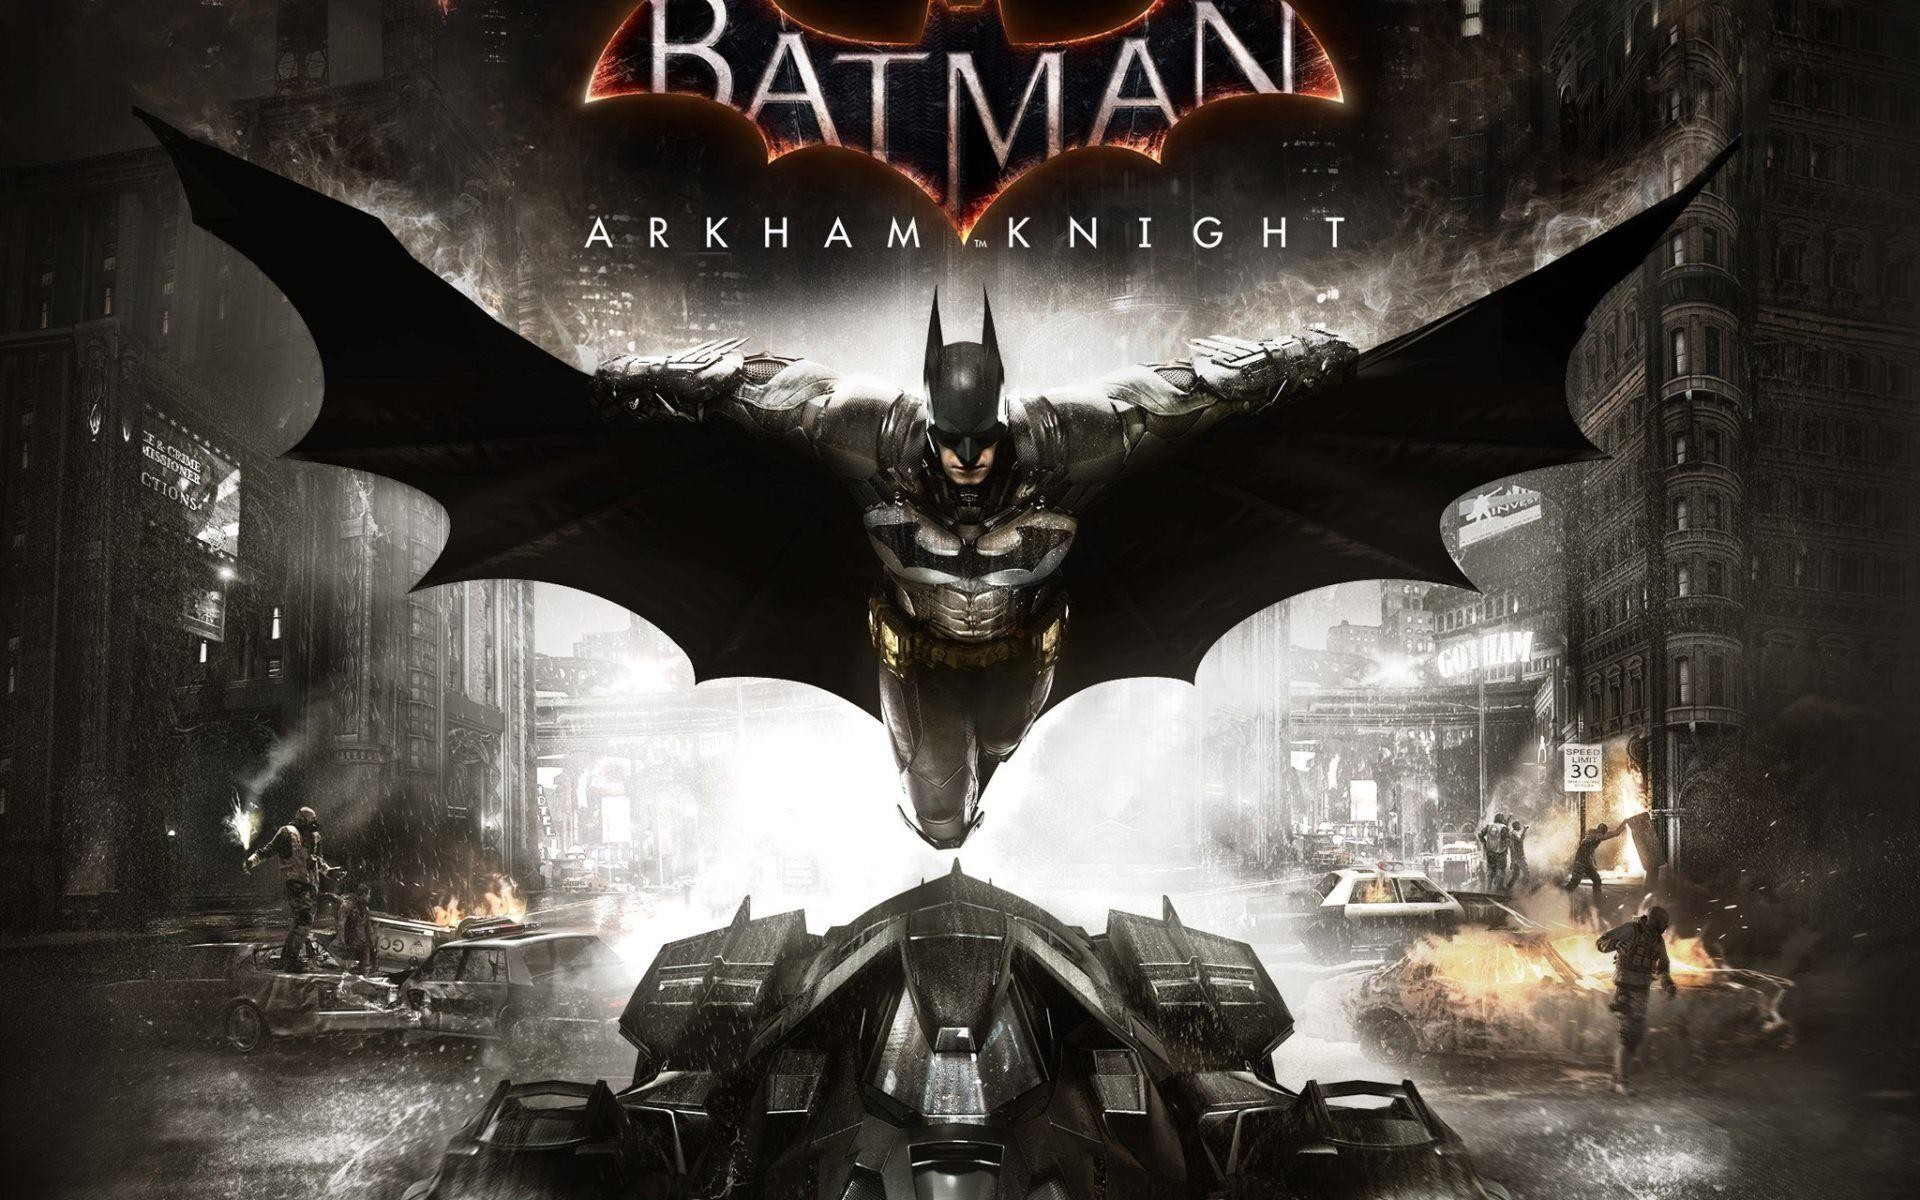 Batman: Arkham Knight Wallpapers · 4K HD Desktop Backgrounds Phone .